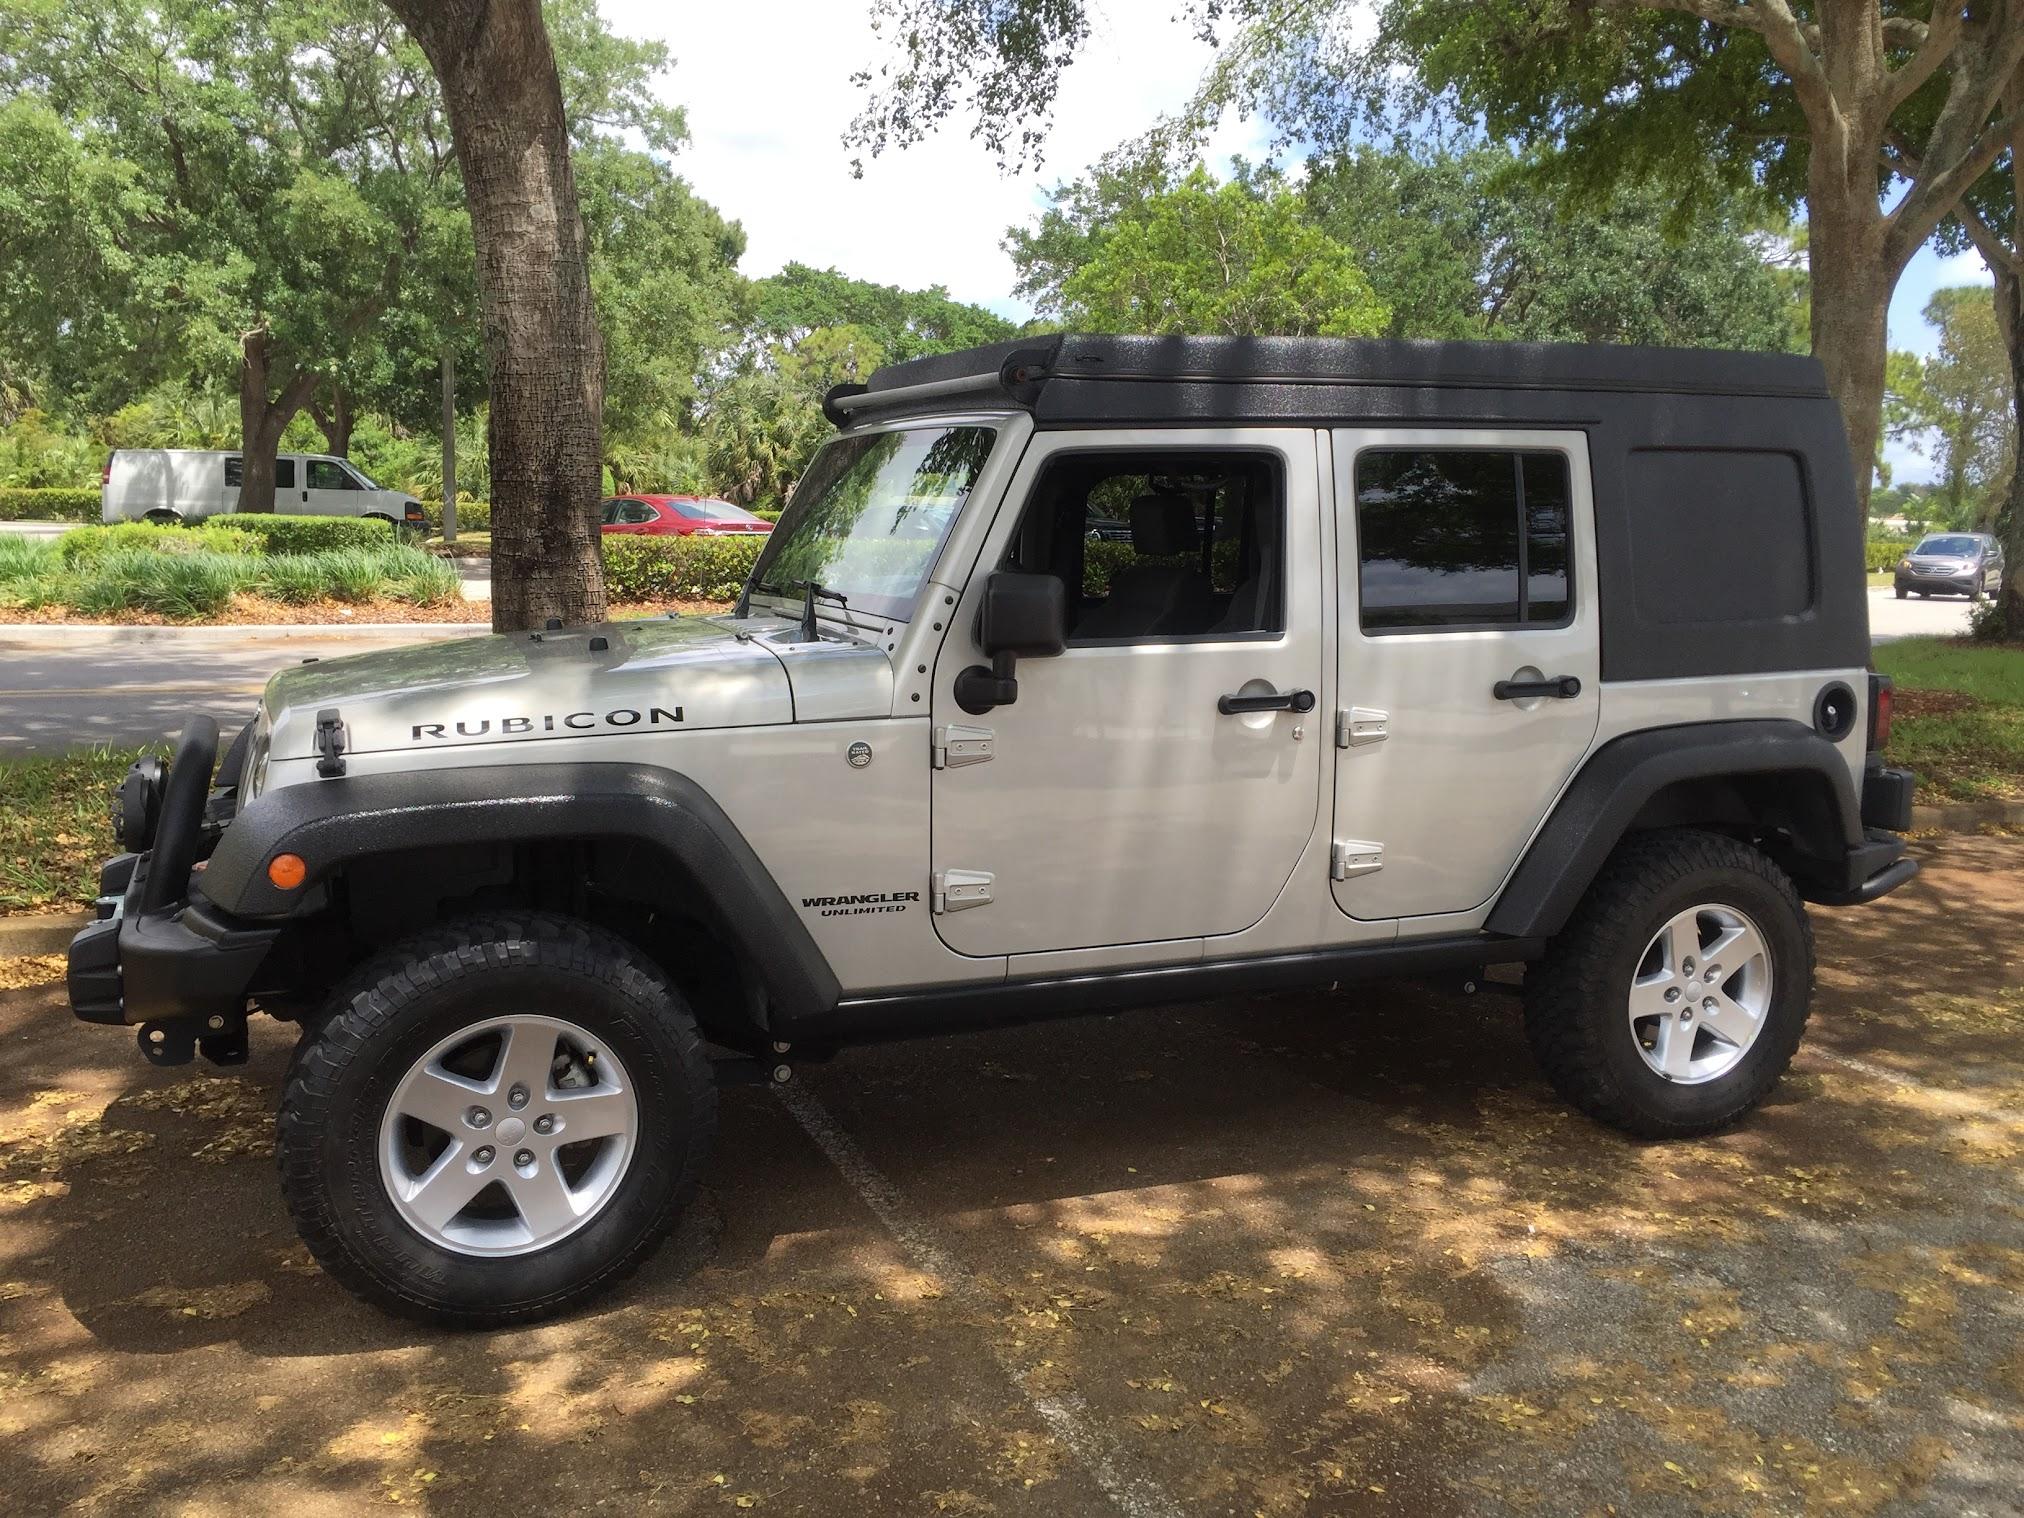 For Sale: Jeep JK Habitat AT Overland/Ursa Minor Vehicles